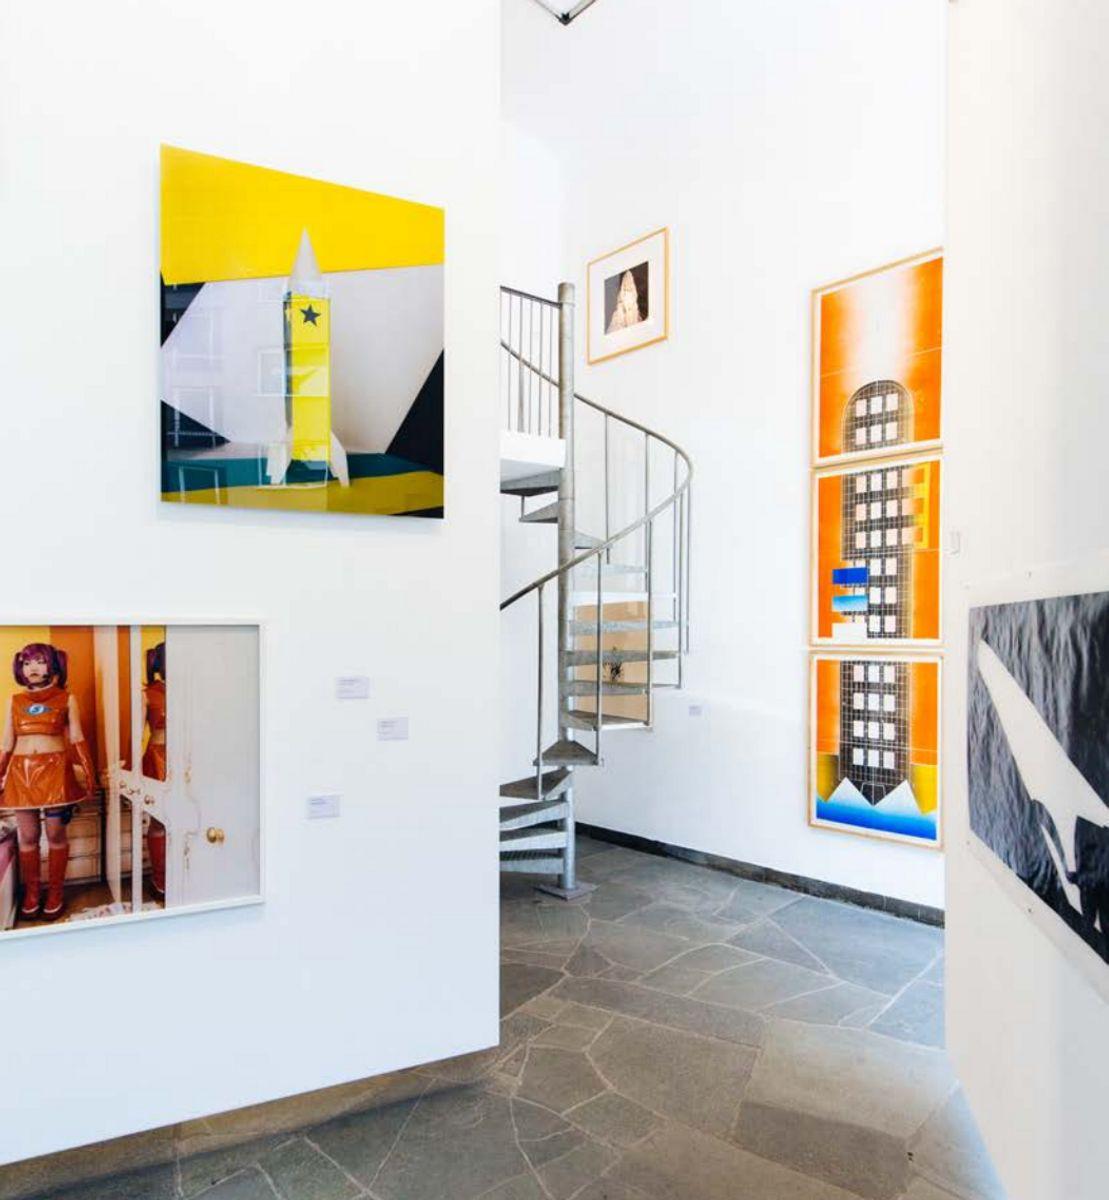 Parrotta Contemporary Art | Cologne